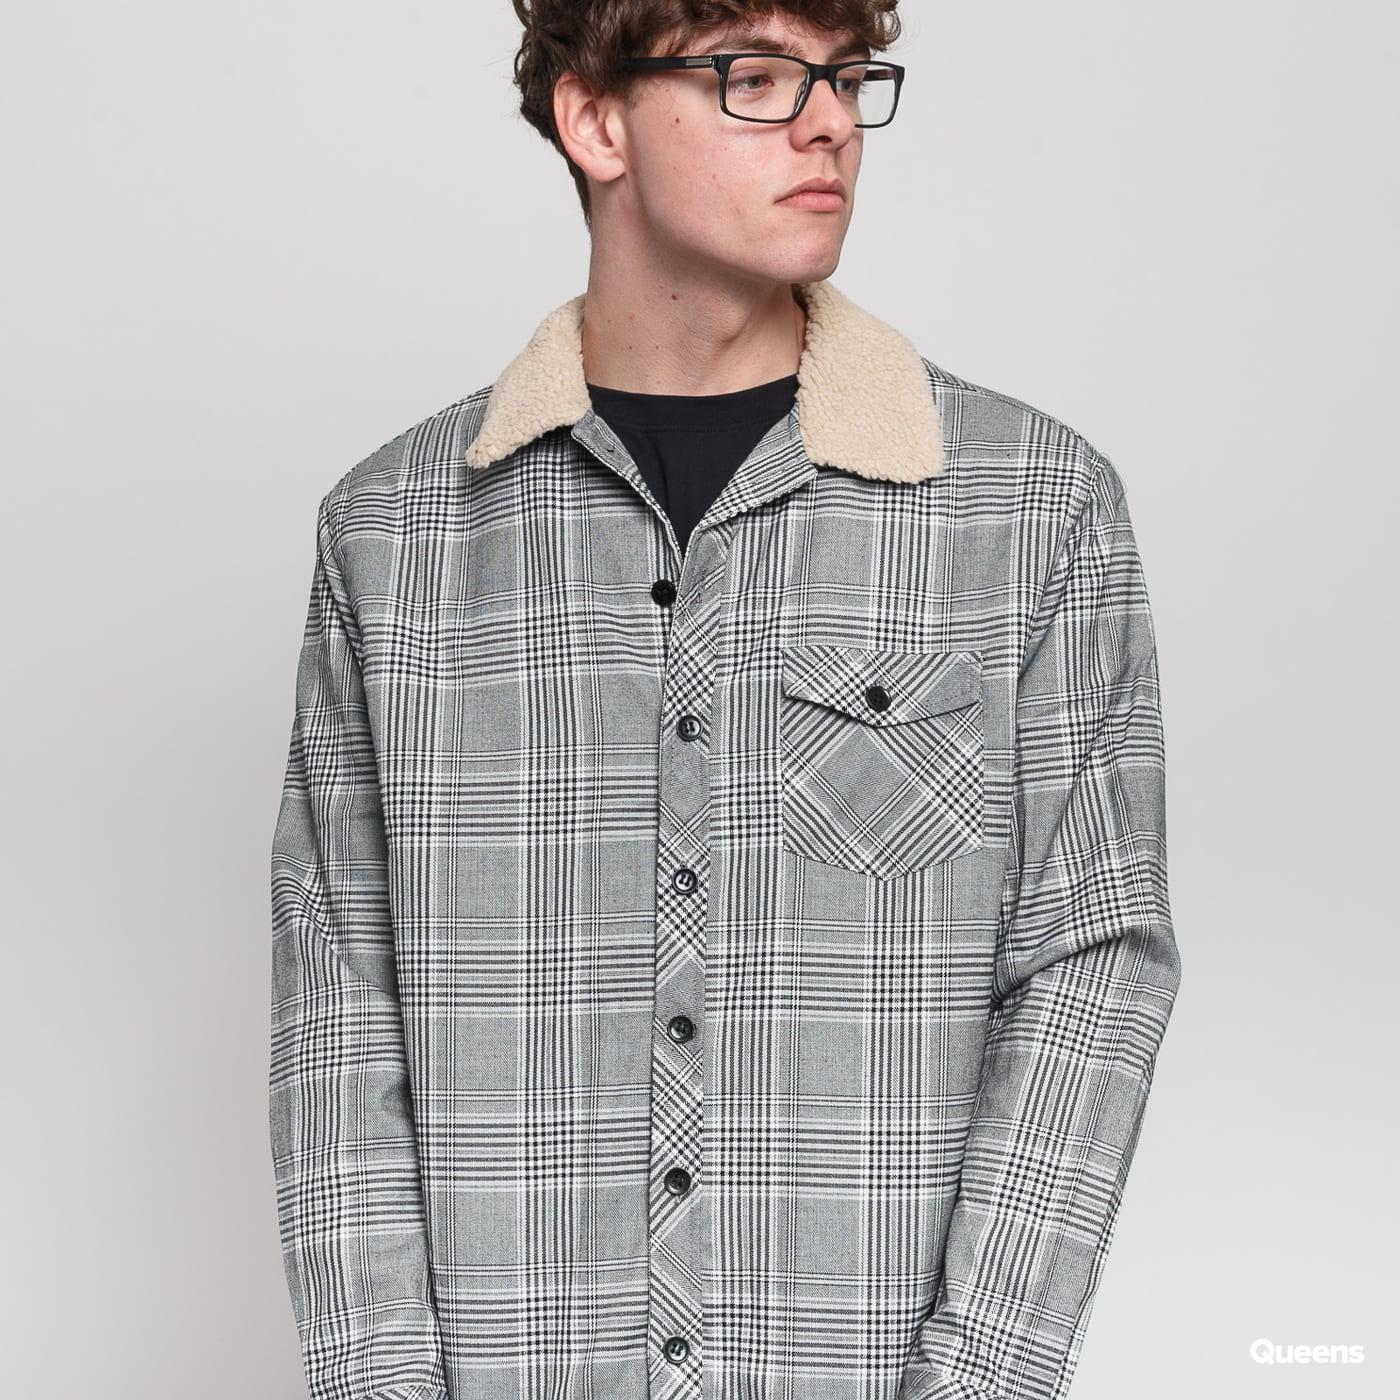 Urban Classics Sherpa Lined Glencheck Shirt Jacket black / white